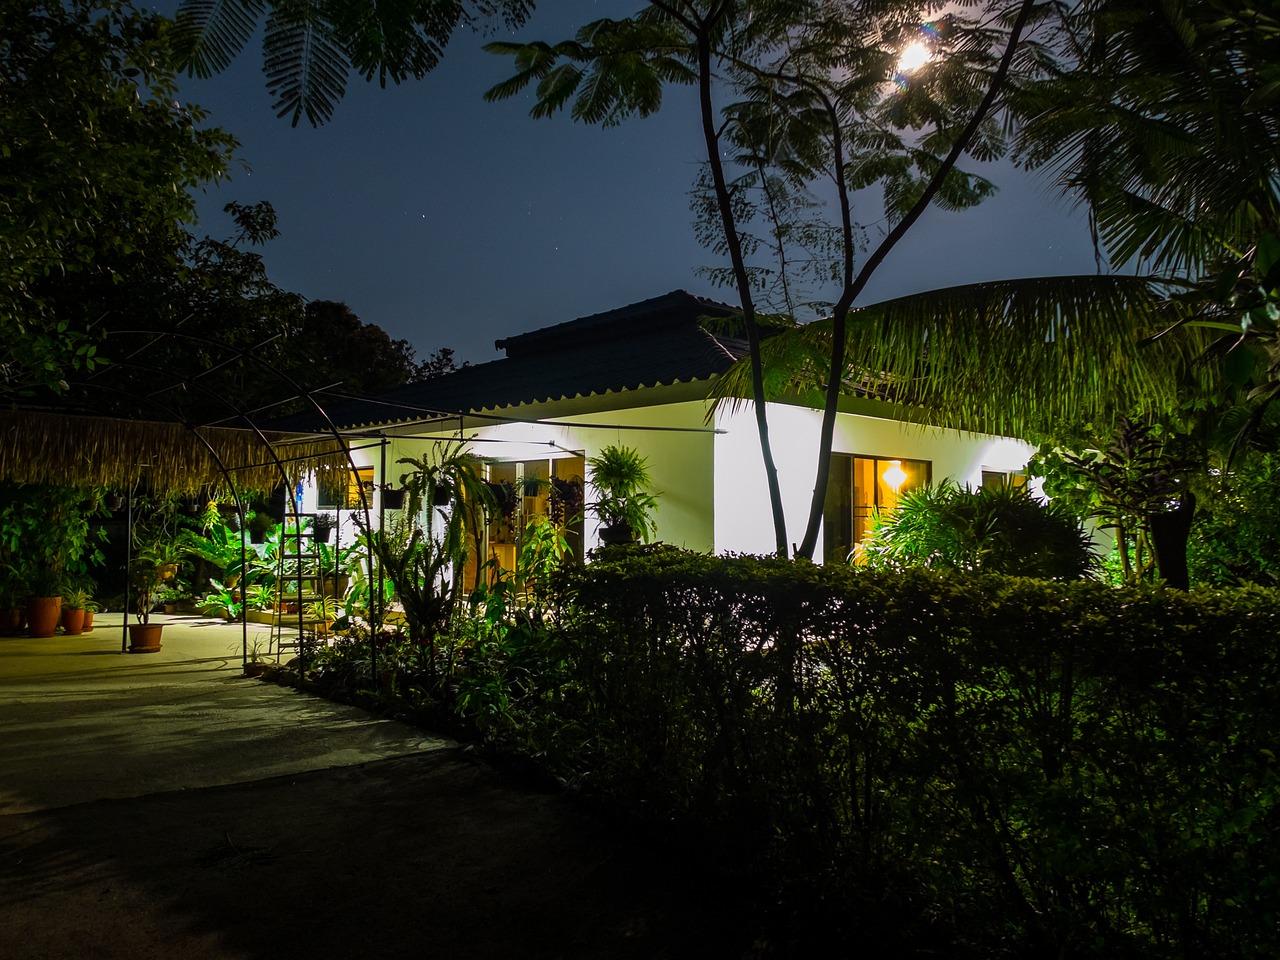 Full Moon Night House Garden Free Photo On Pixabay